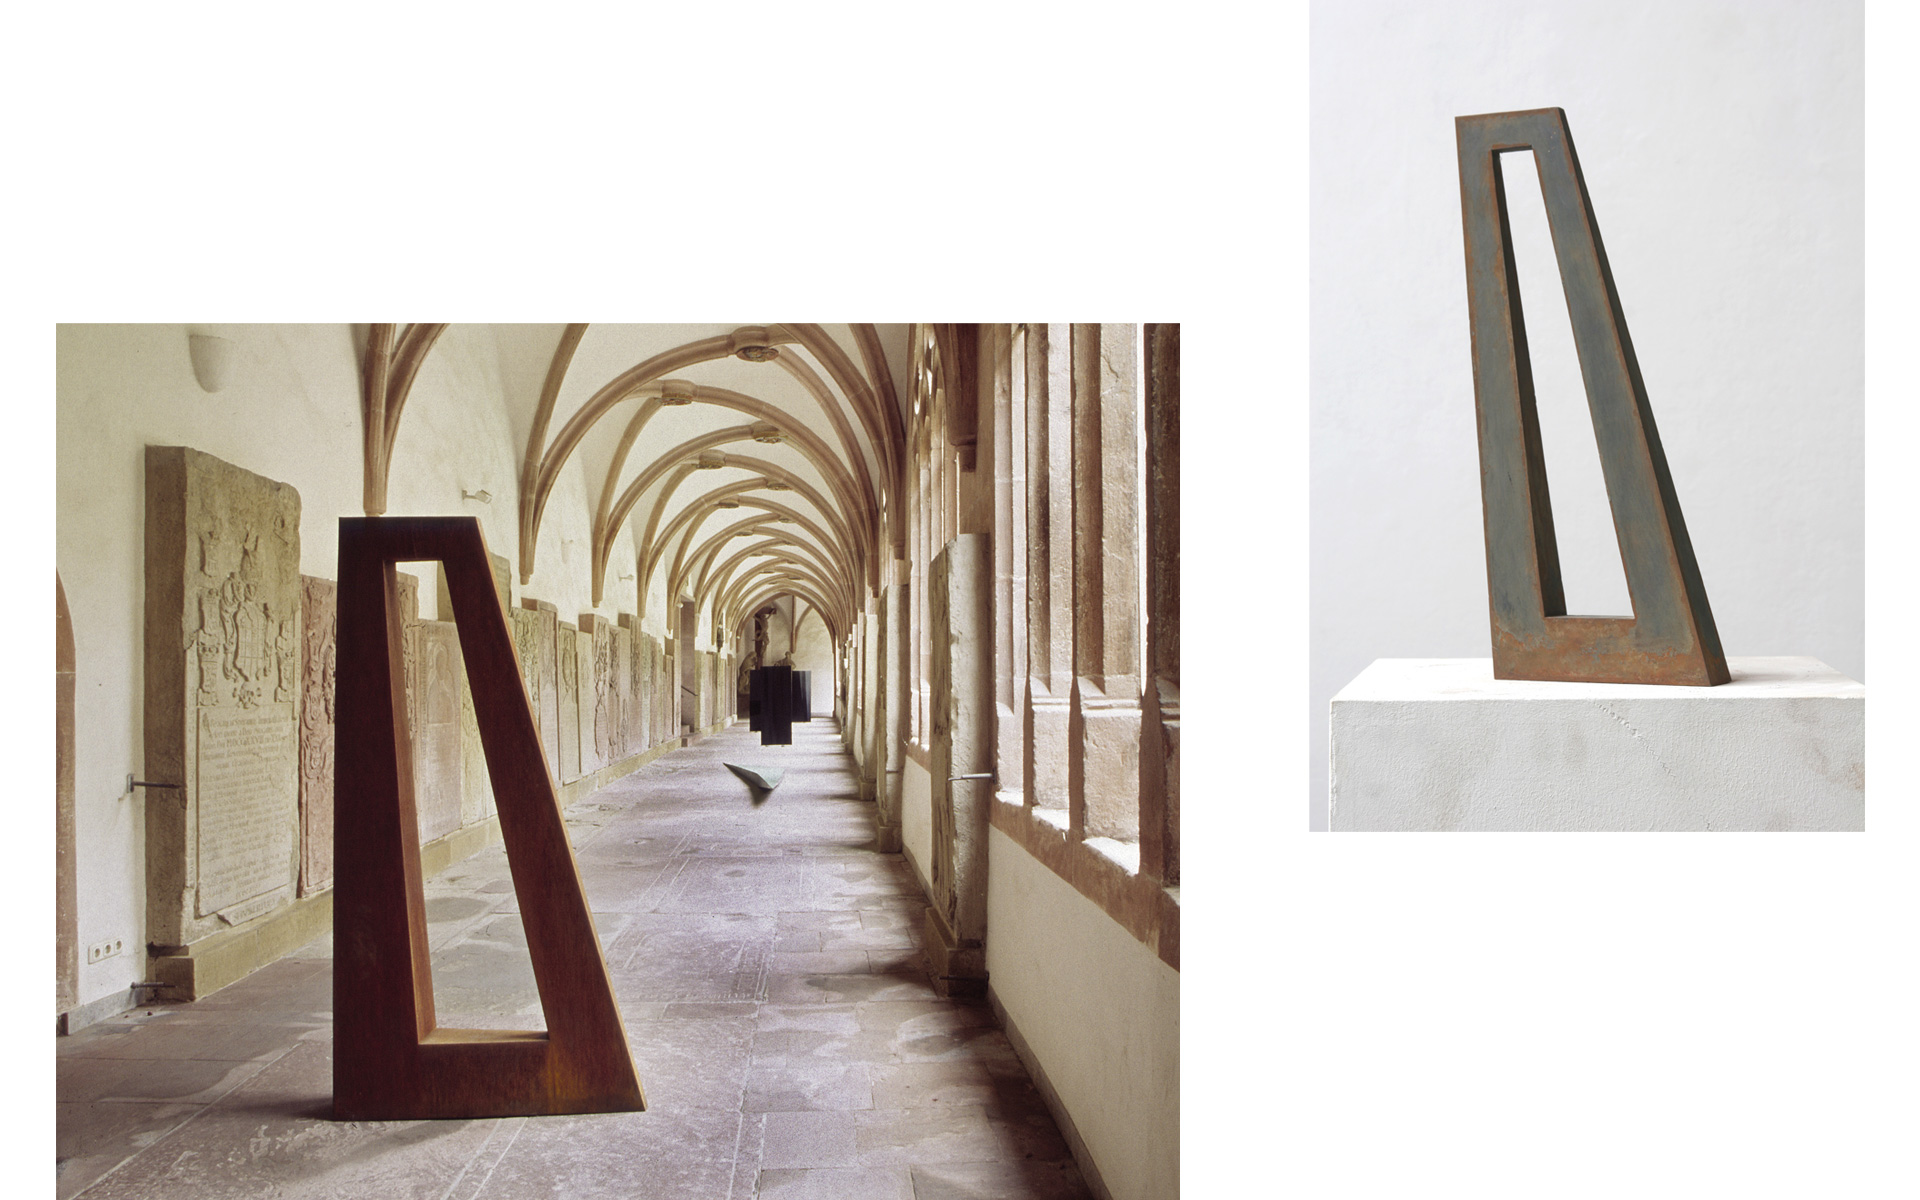 left: Installation view cloister Dom St. Kilian, Würzburg, 2001 / right: WINDOW, 2008 Steel 42 × 19 × 4.5 cm - Photos: Christoph Valentien